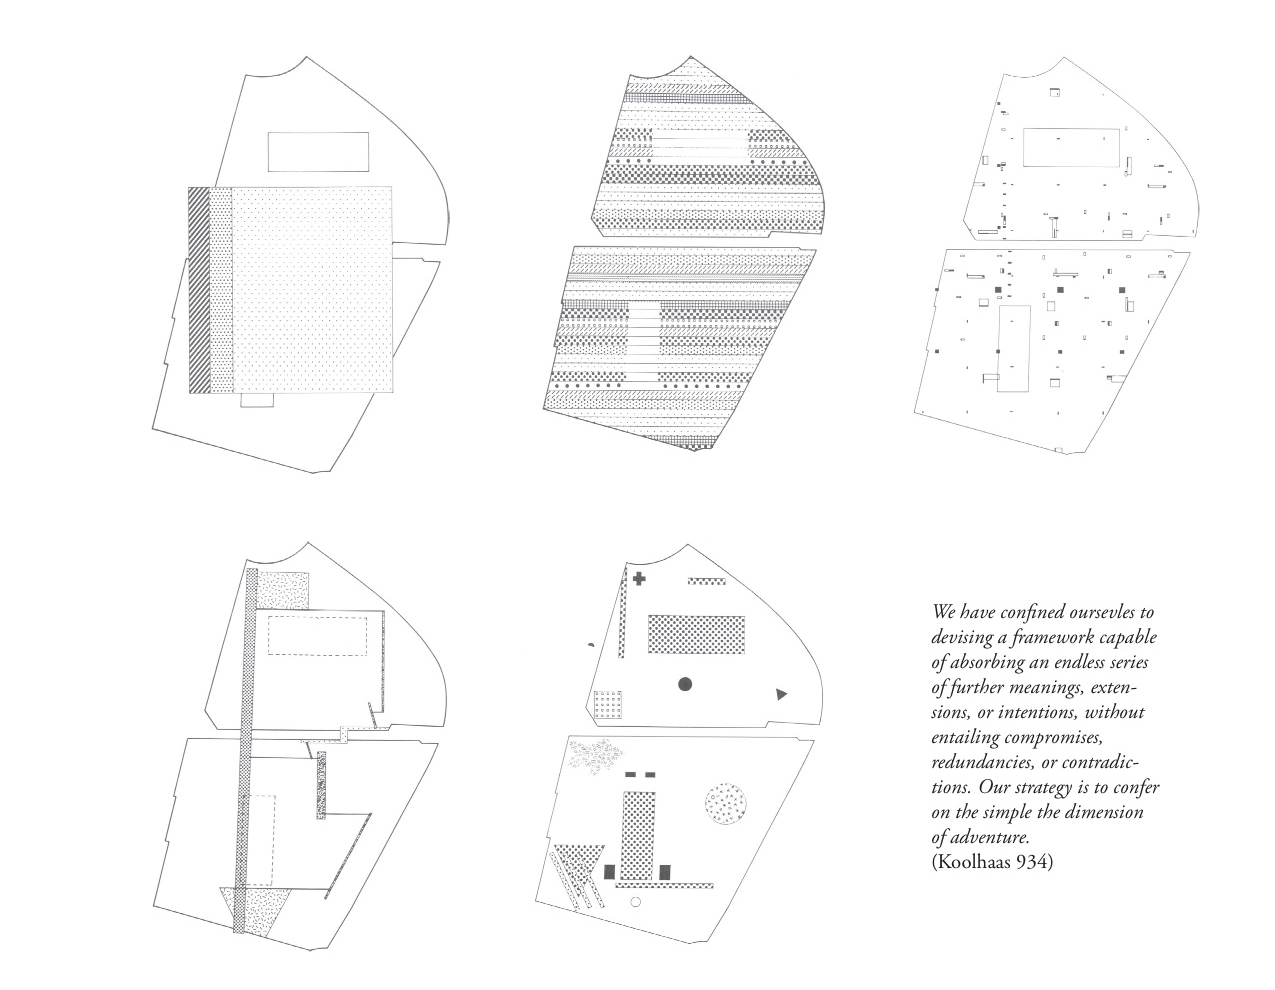 oma parc de la villette diagram fender american standard strat wiring về rem koolhaas đô thị học hiện hữu và tương